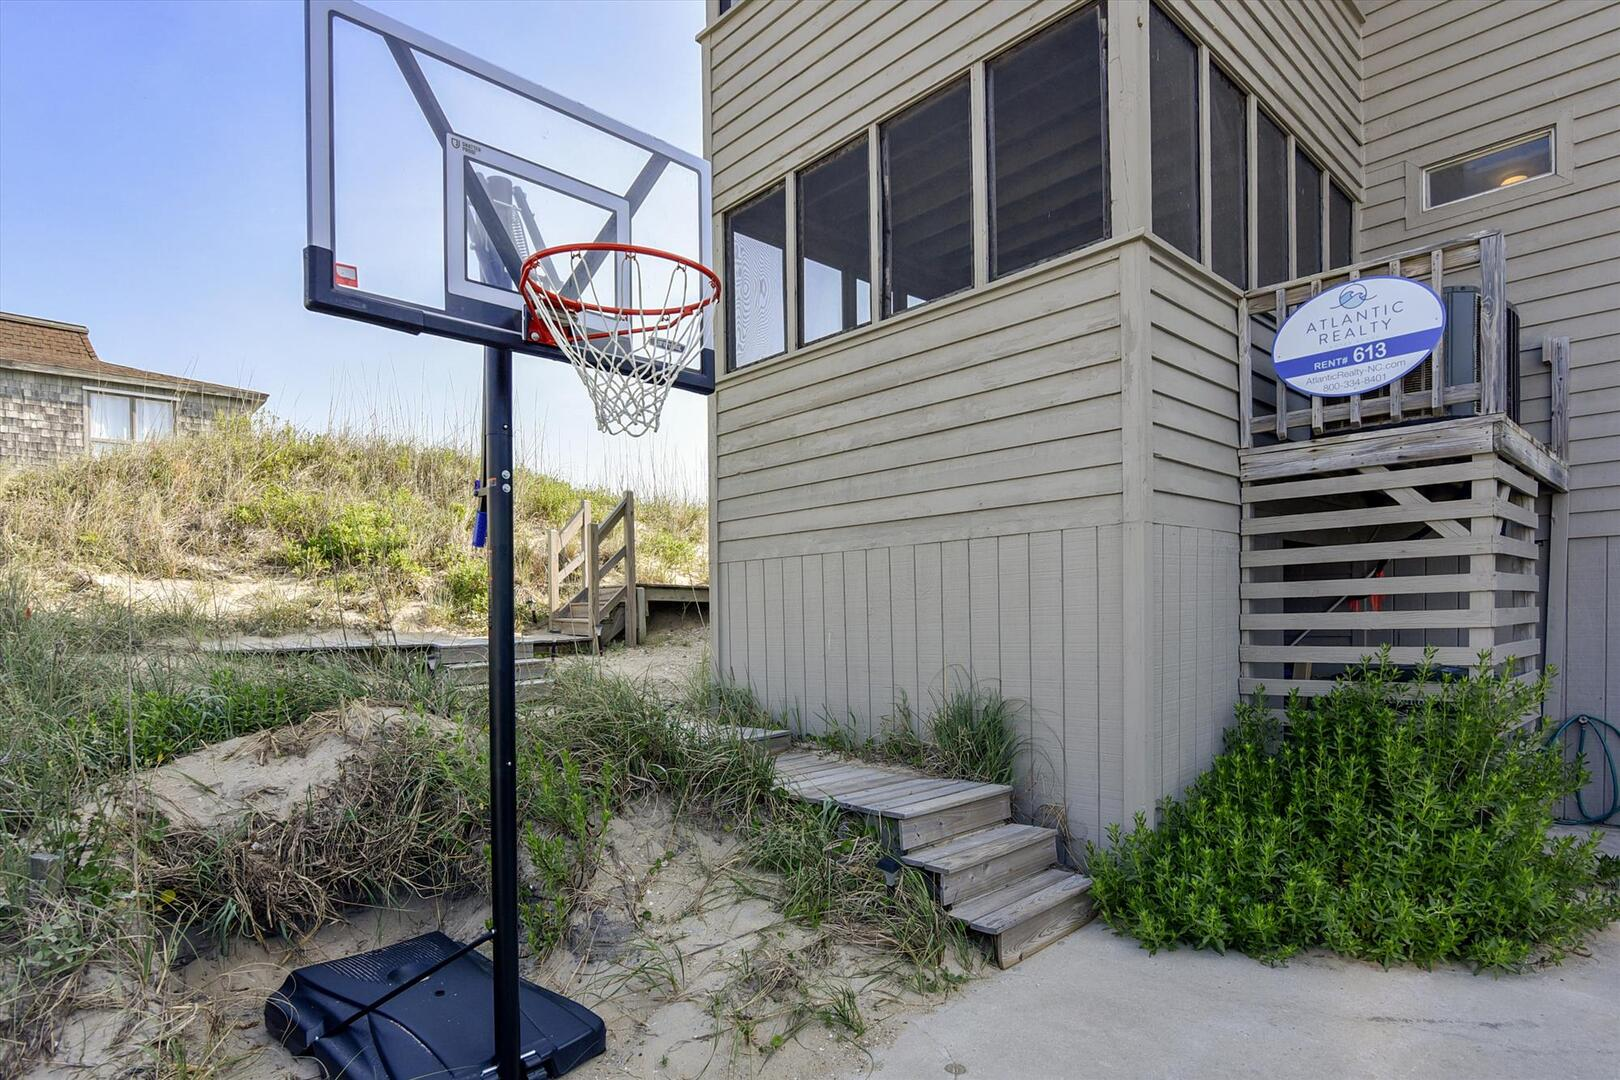 Lower/Parking Level,Basketball,